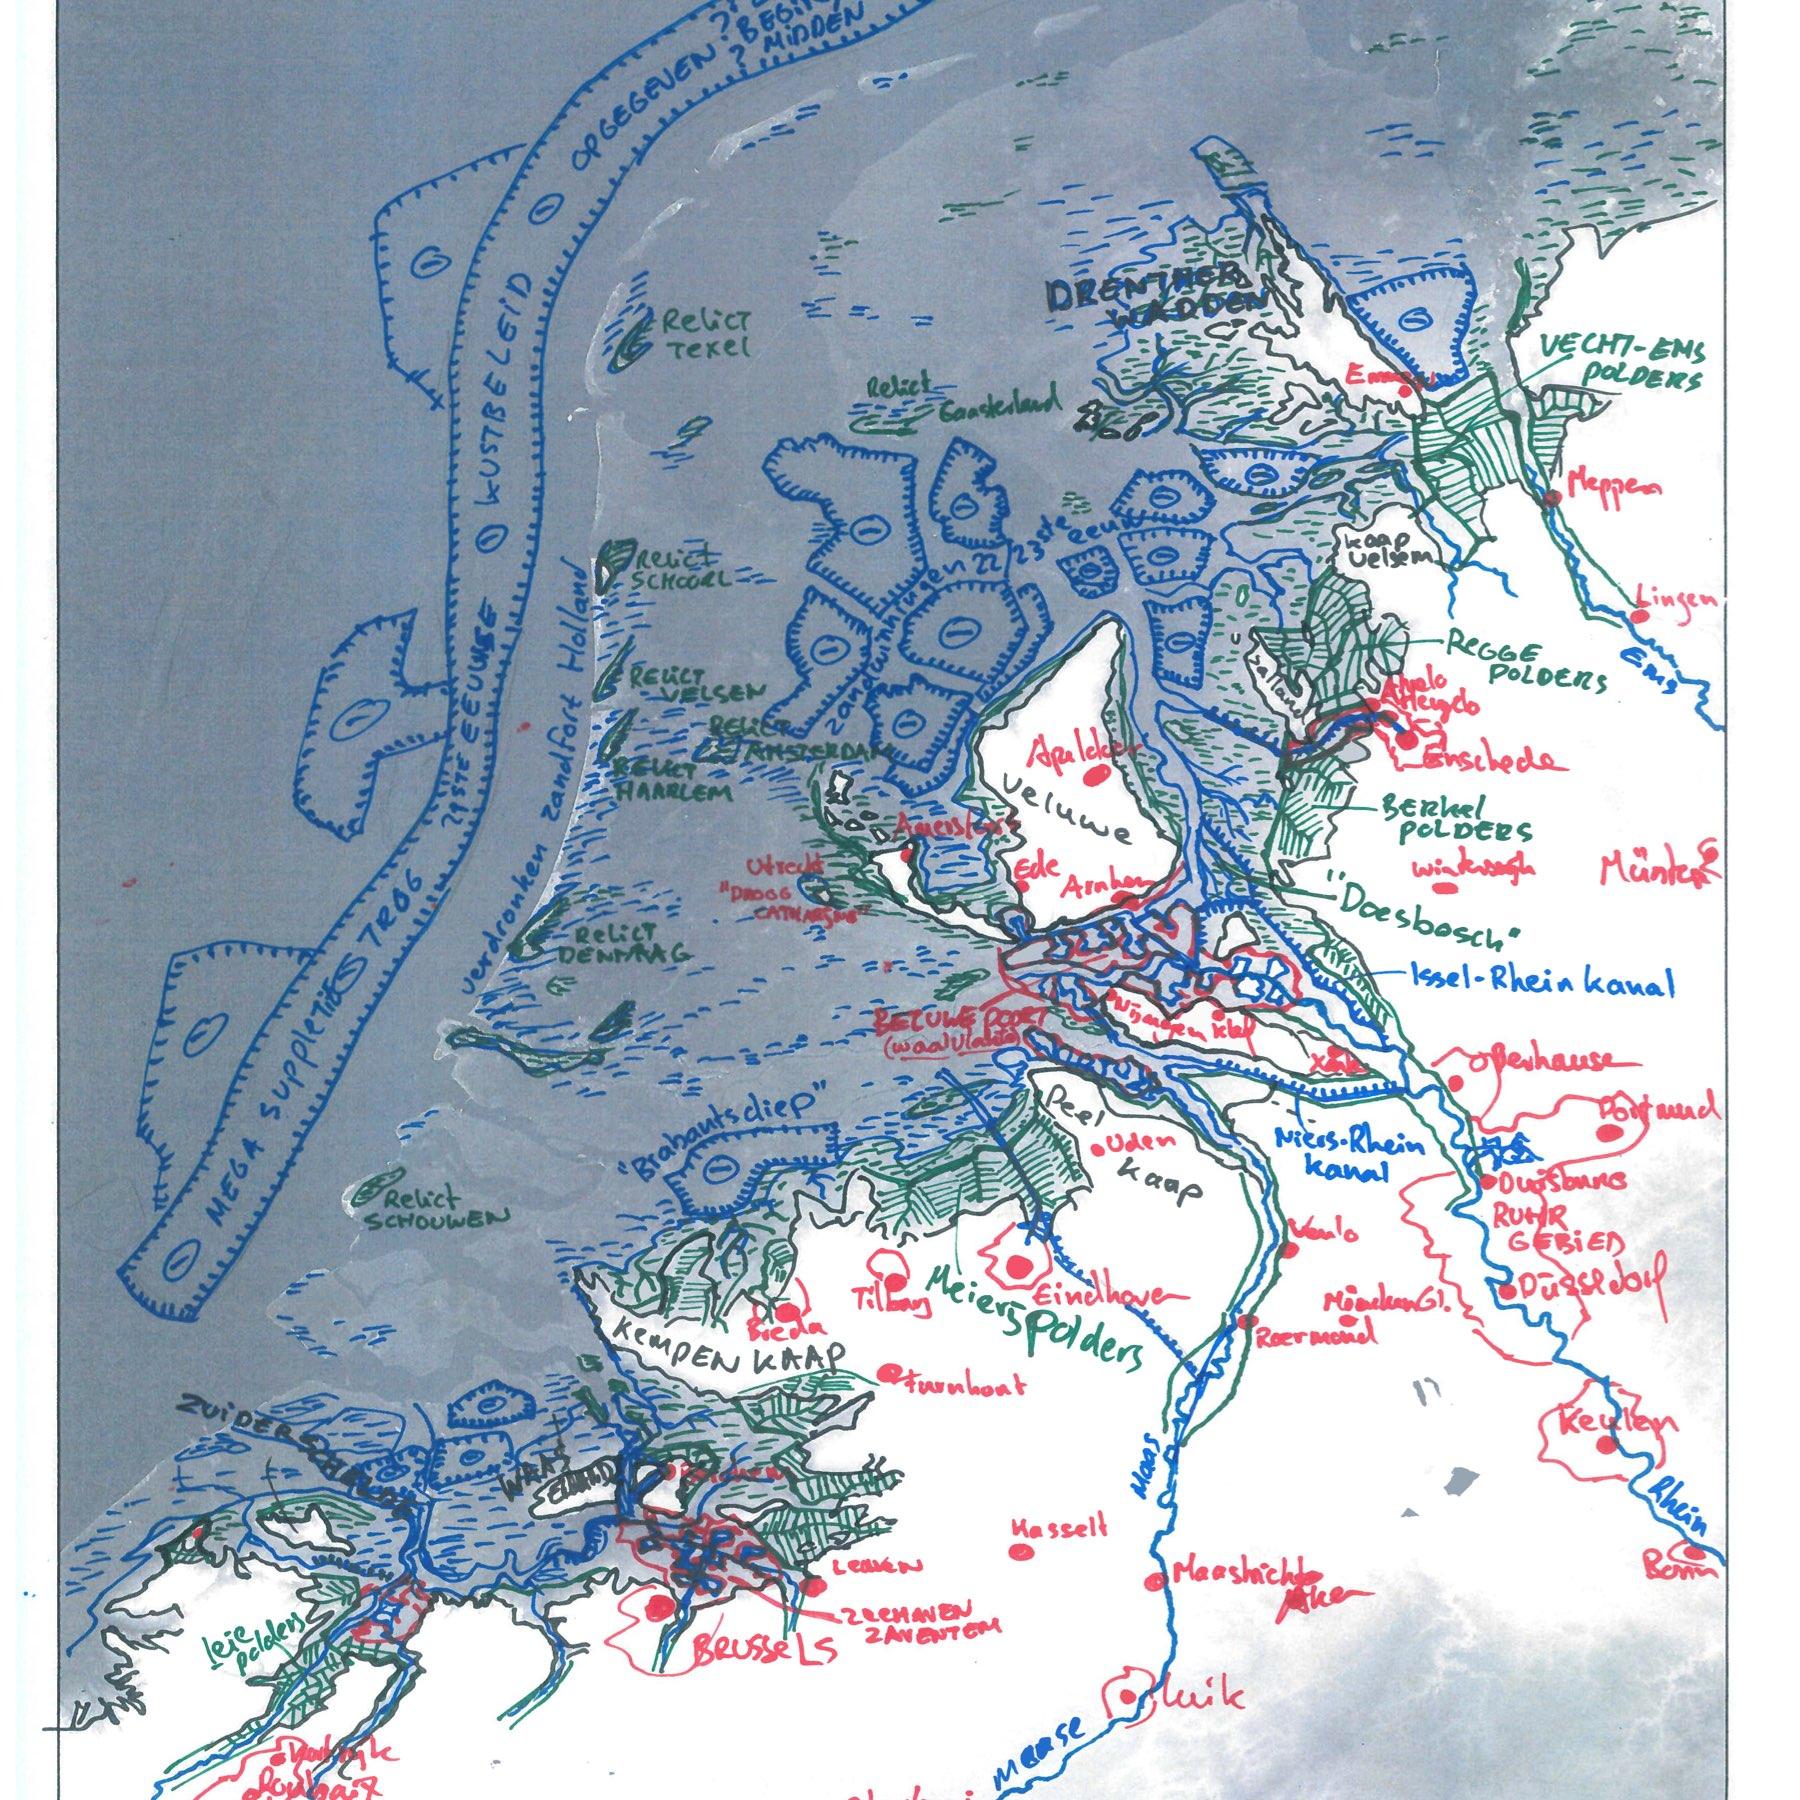 Netherlands in 2300